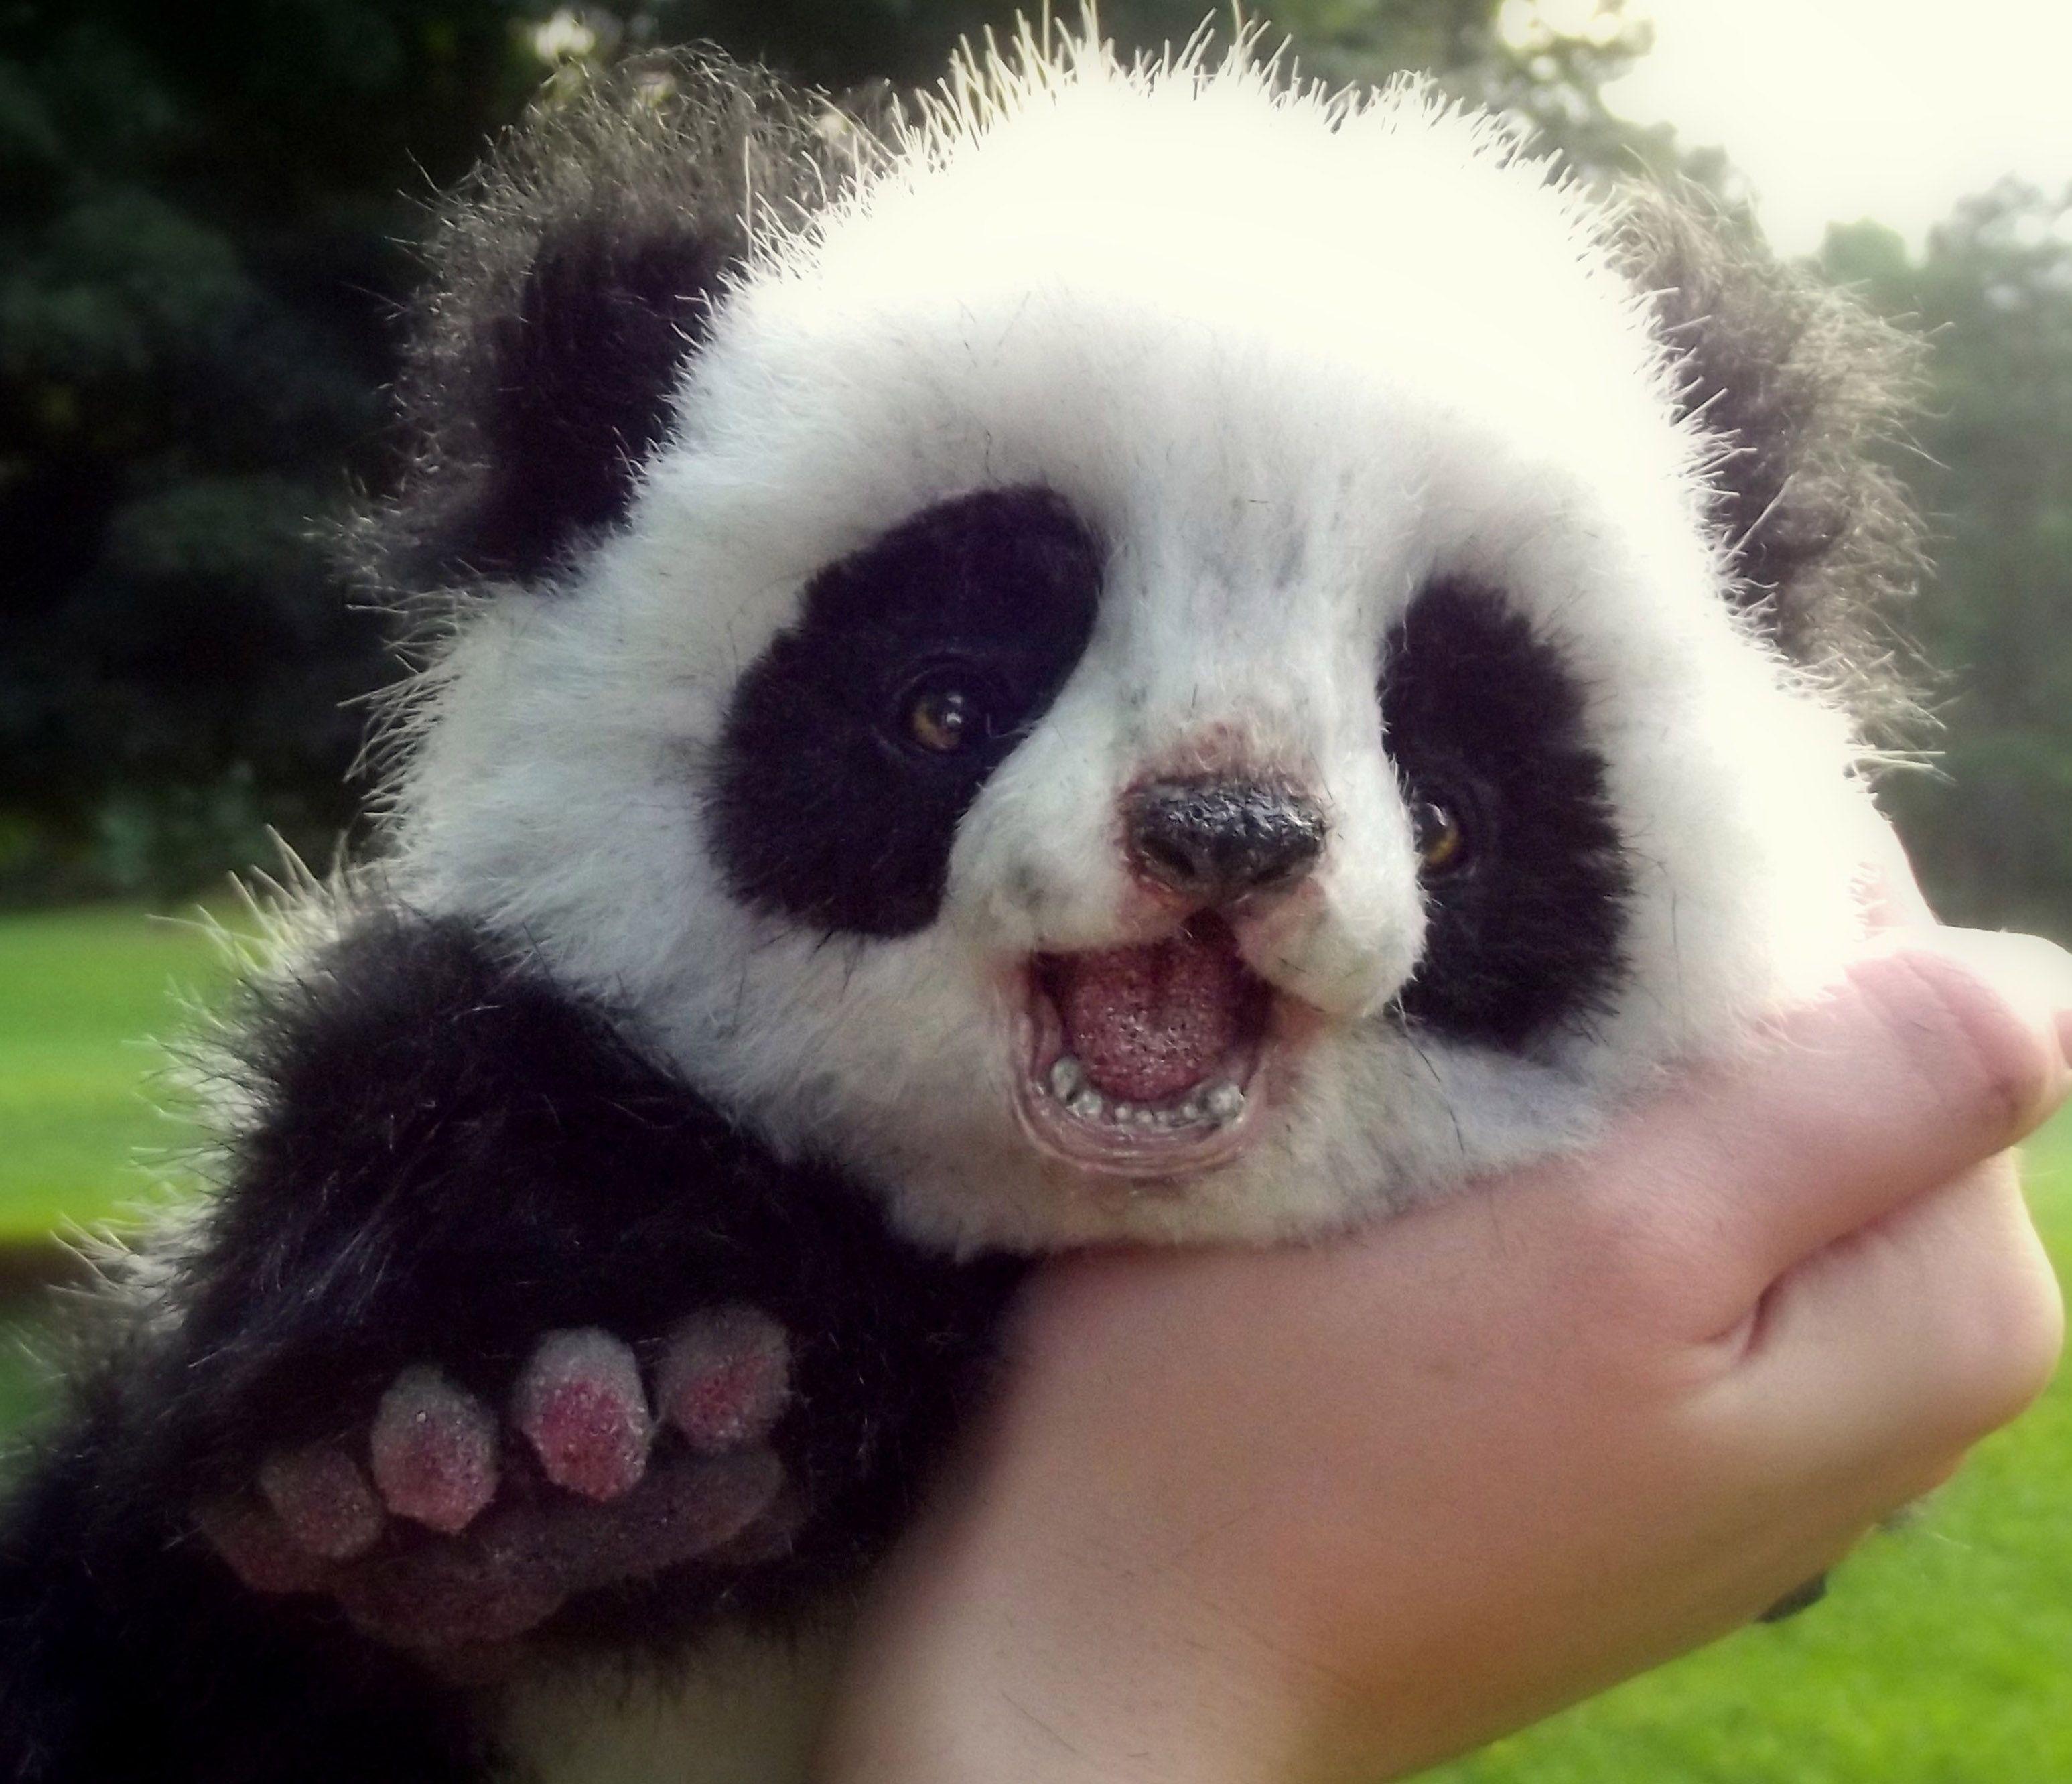 Cute Animal Wallpapers, Hd Wild Life Photos, Best Friends